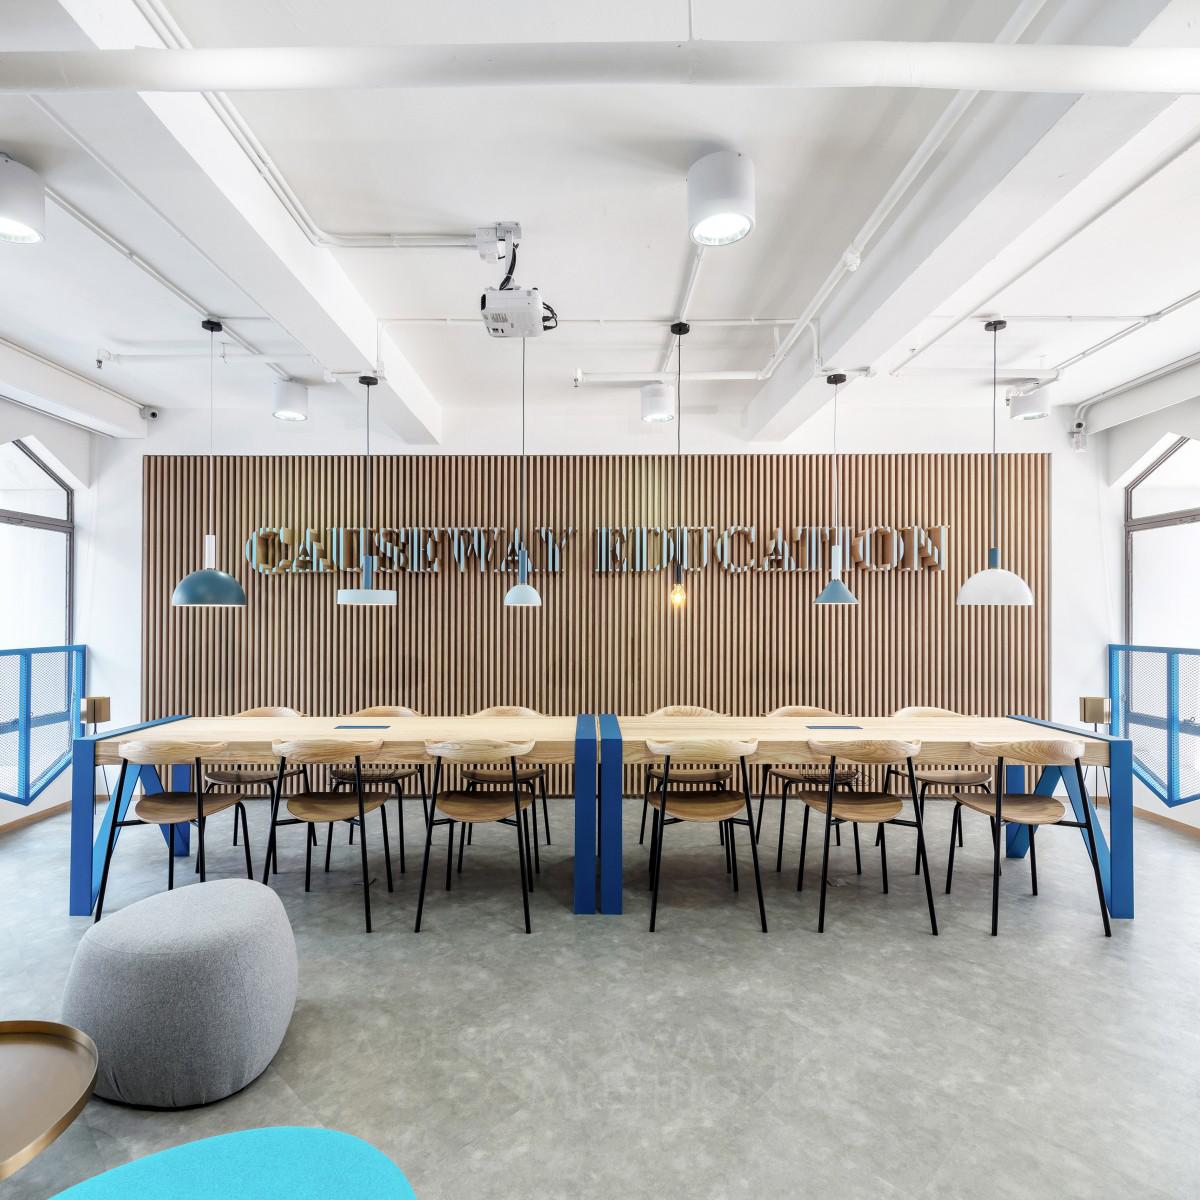 Causeway Education Centre Institution